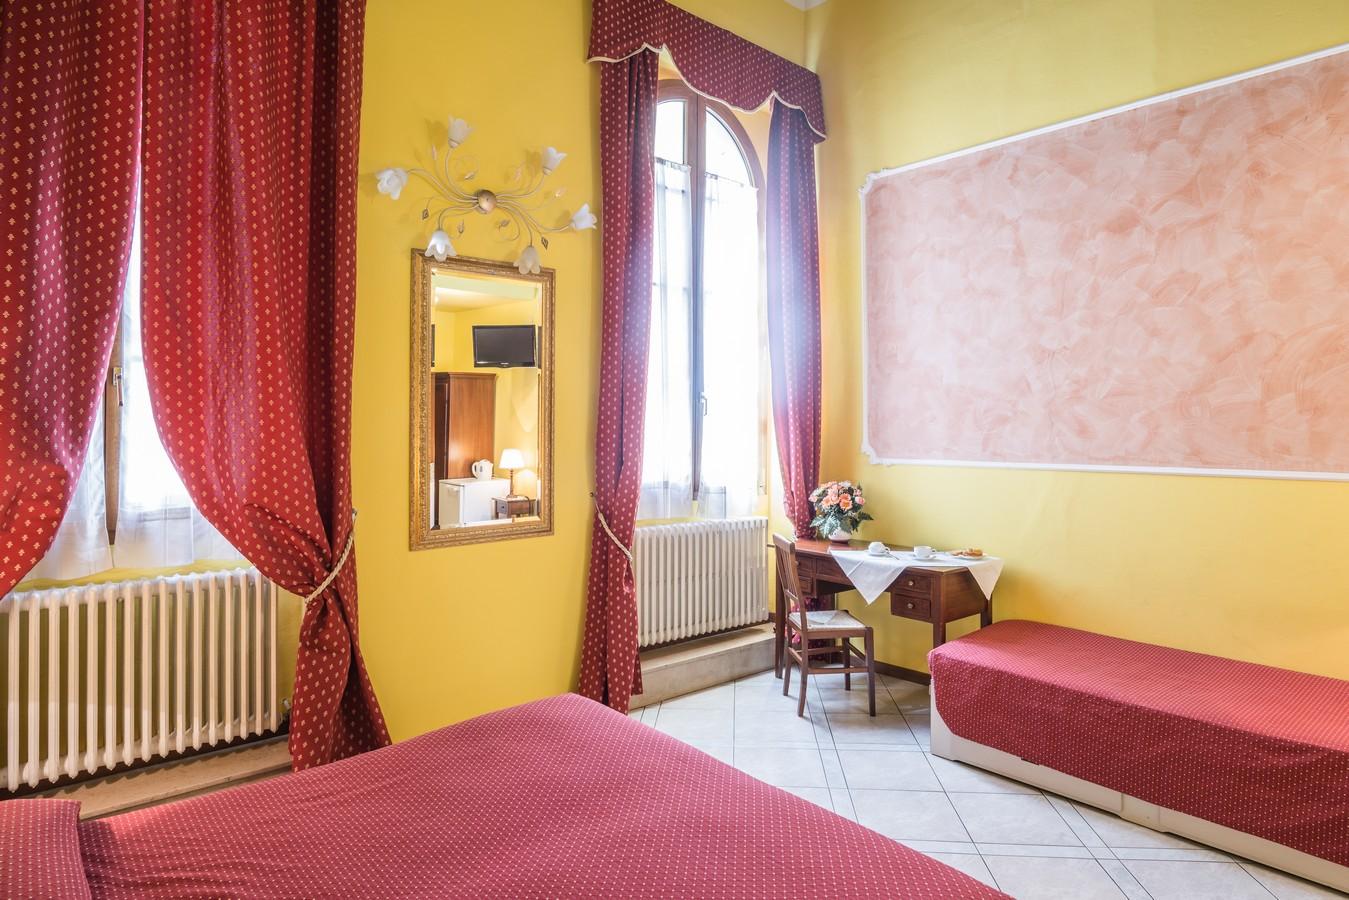 BED AND BREAKFAST Firenze Toscana - Soggiorno Alessandra Firenze